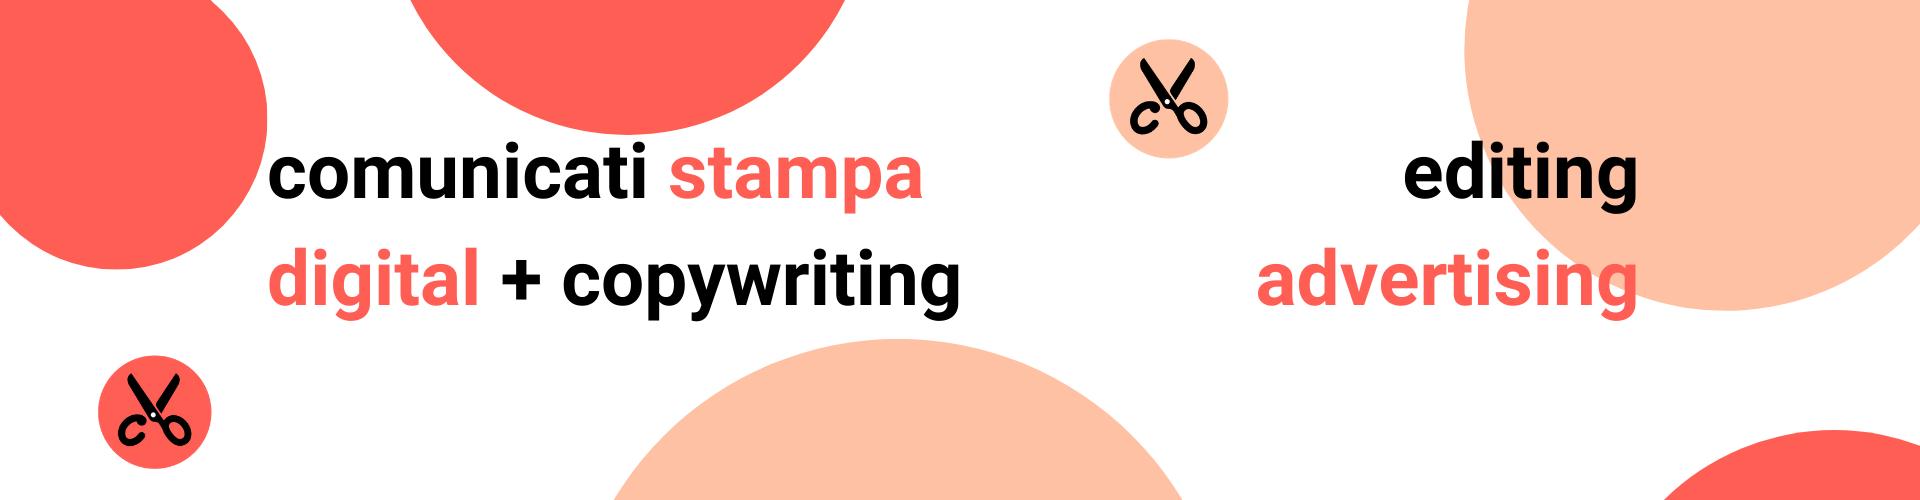 servizi di copywriting, comunicati stampa, editing, advertising, scrivo testi per siti, digital copywriting e copywriting